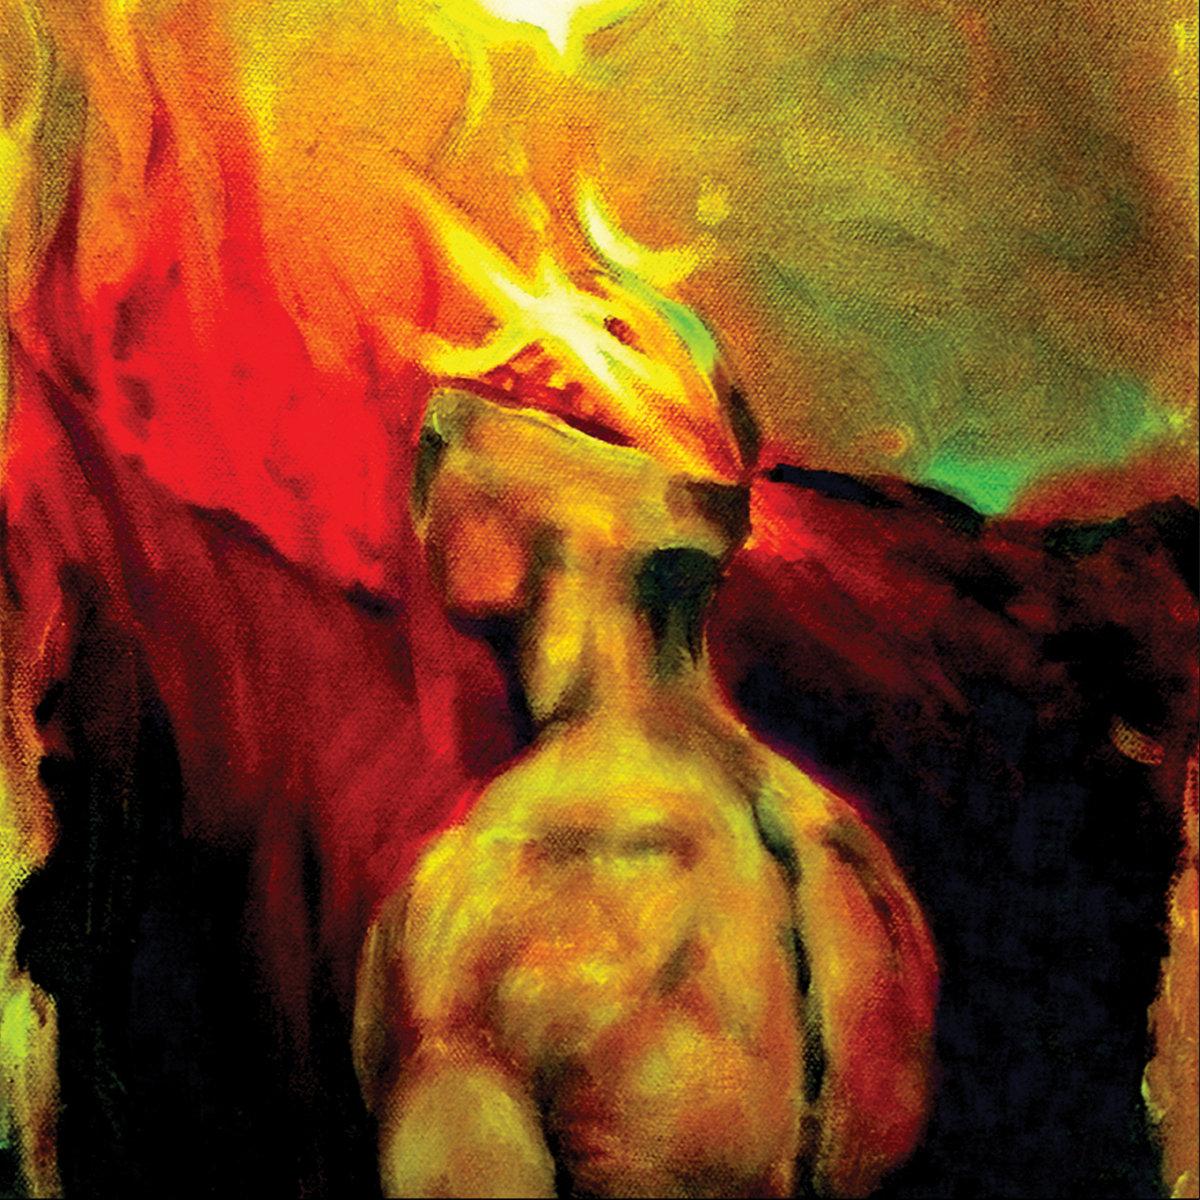 RAEDON KONG - Critical Paths cover